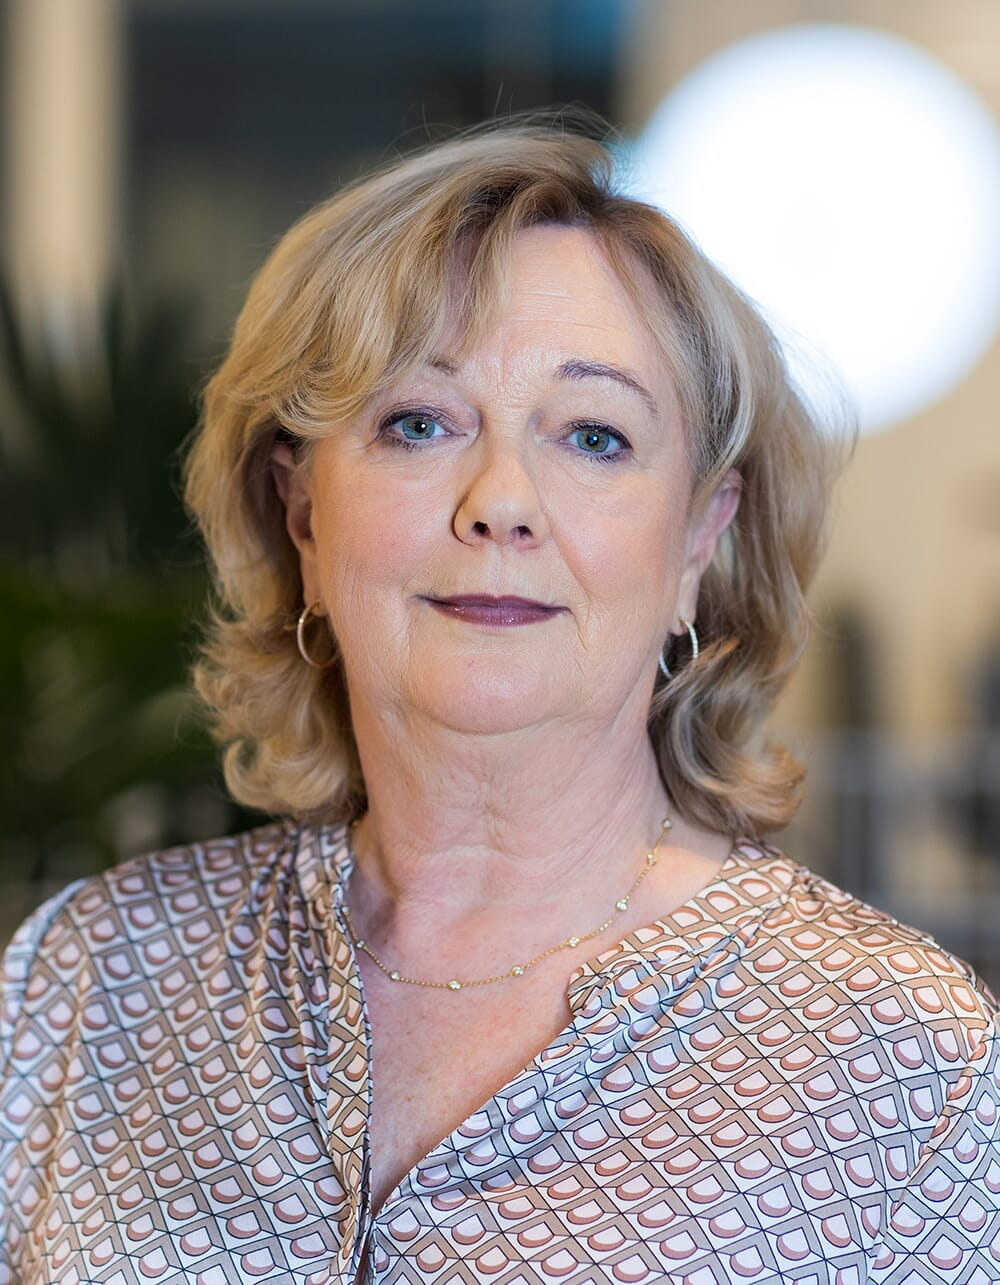 Annette Tiljander